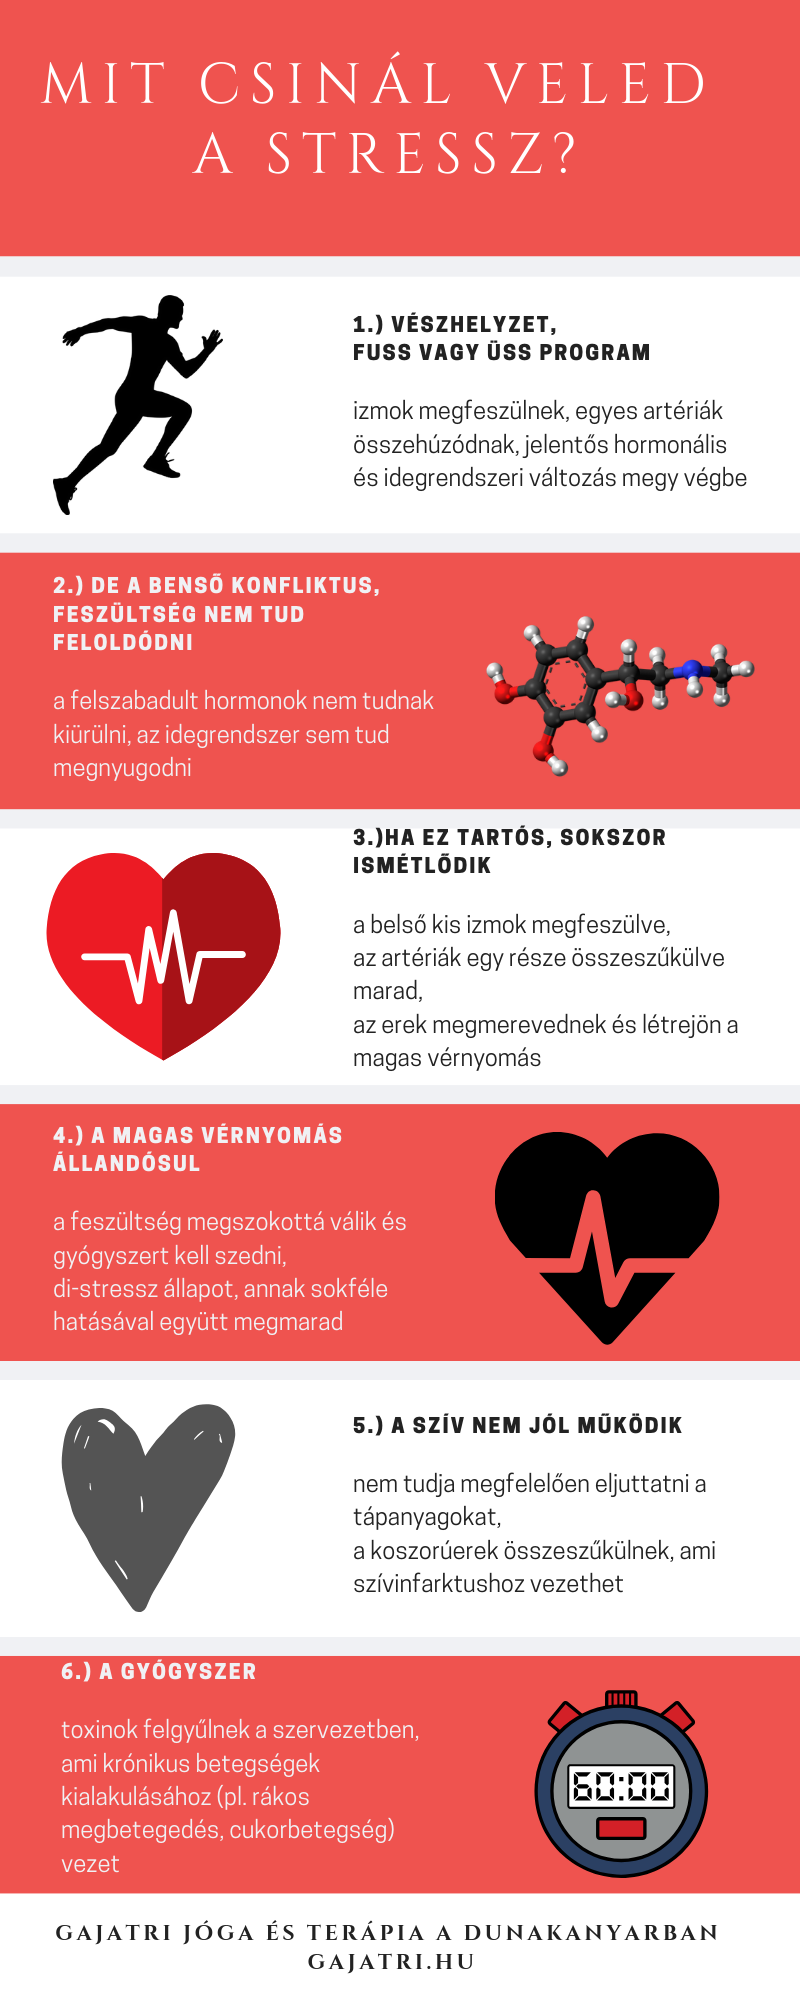 diprospan magas vérnyomás esetén amplipulzus és magas vérnyomás